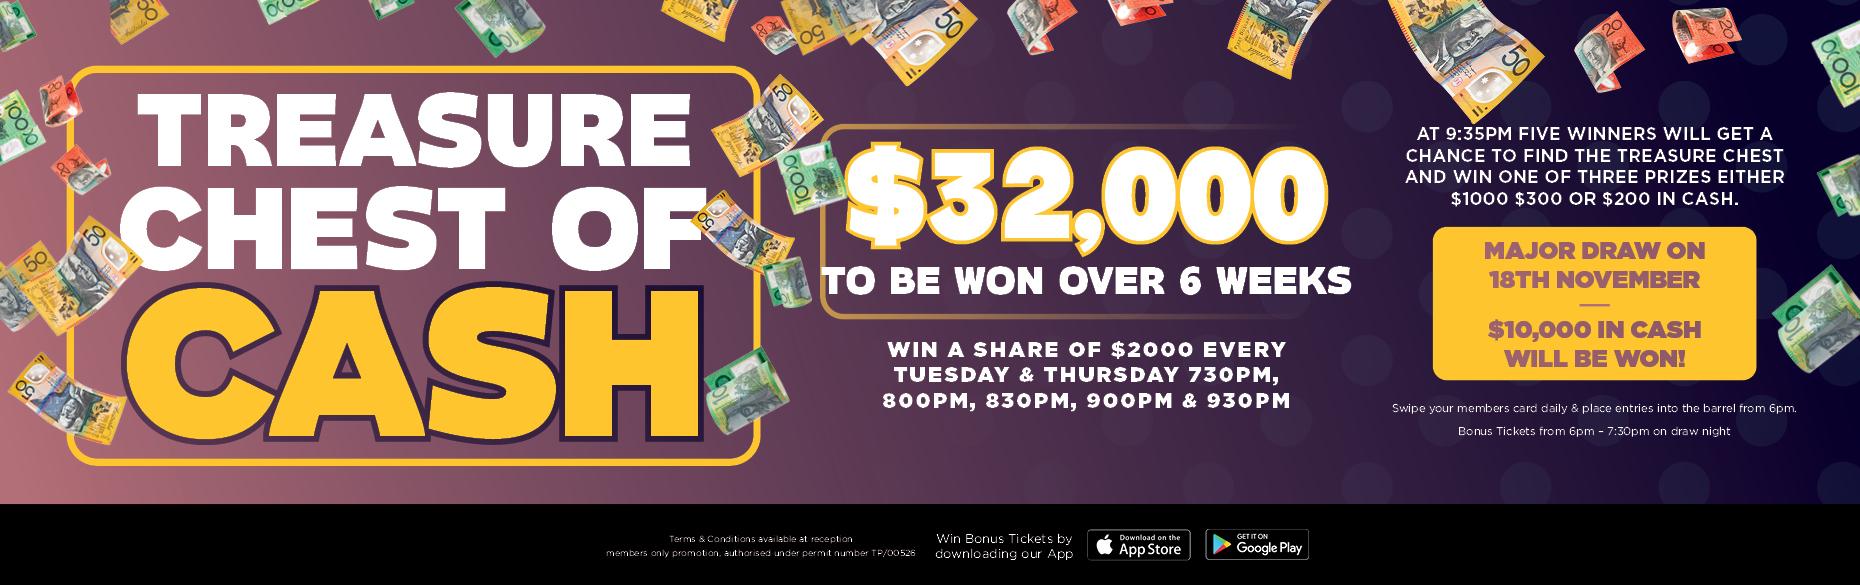 NRSL_-Treasure-Chest-of-Cash-Members-Draw_Resize_Web-banner-003